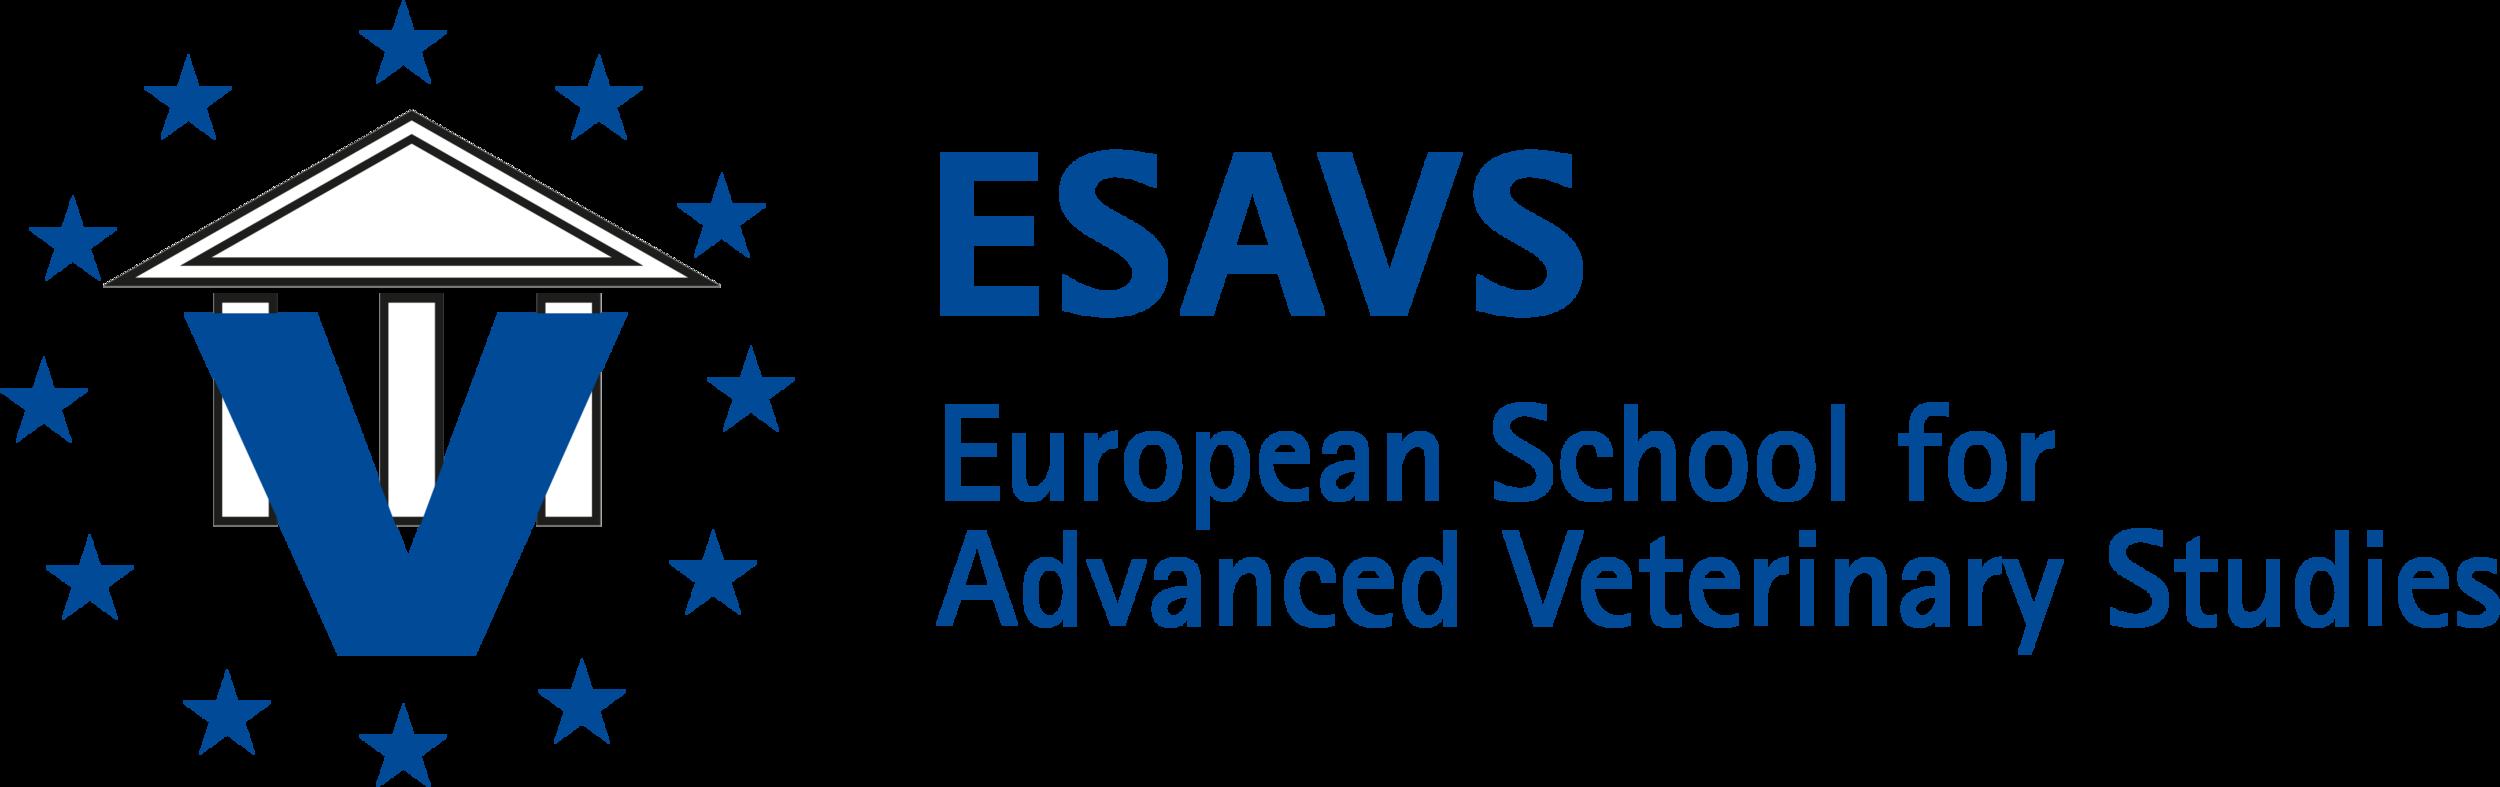 ESAVS Logo .png